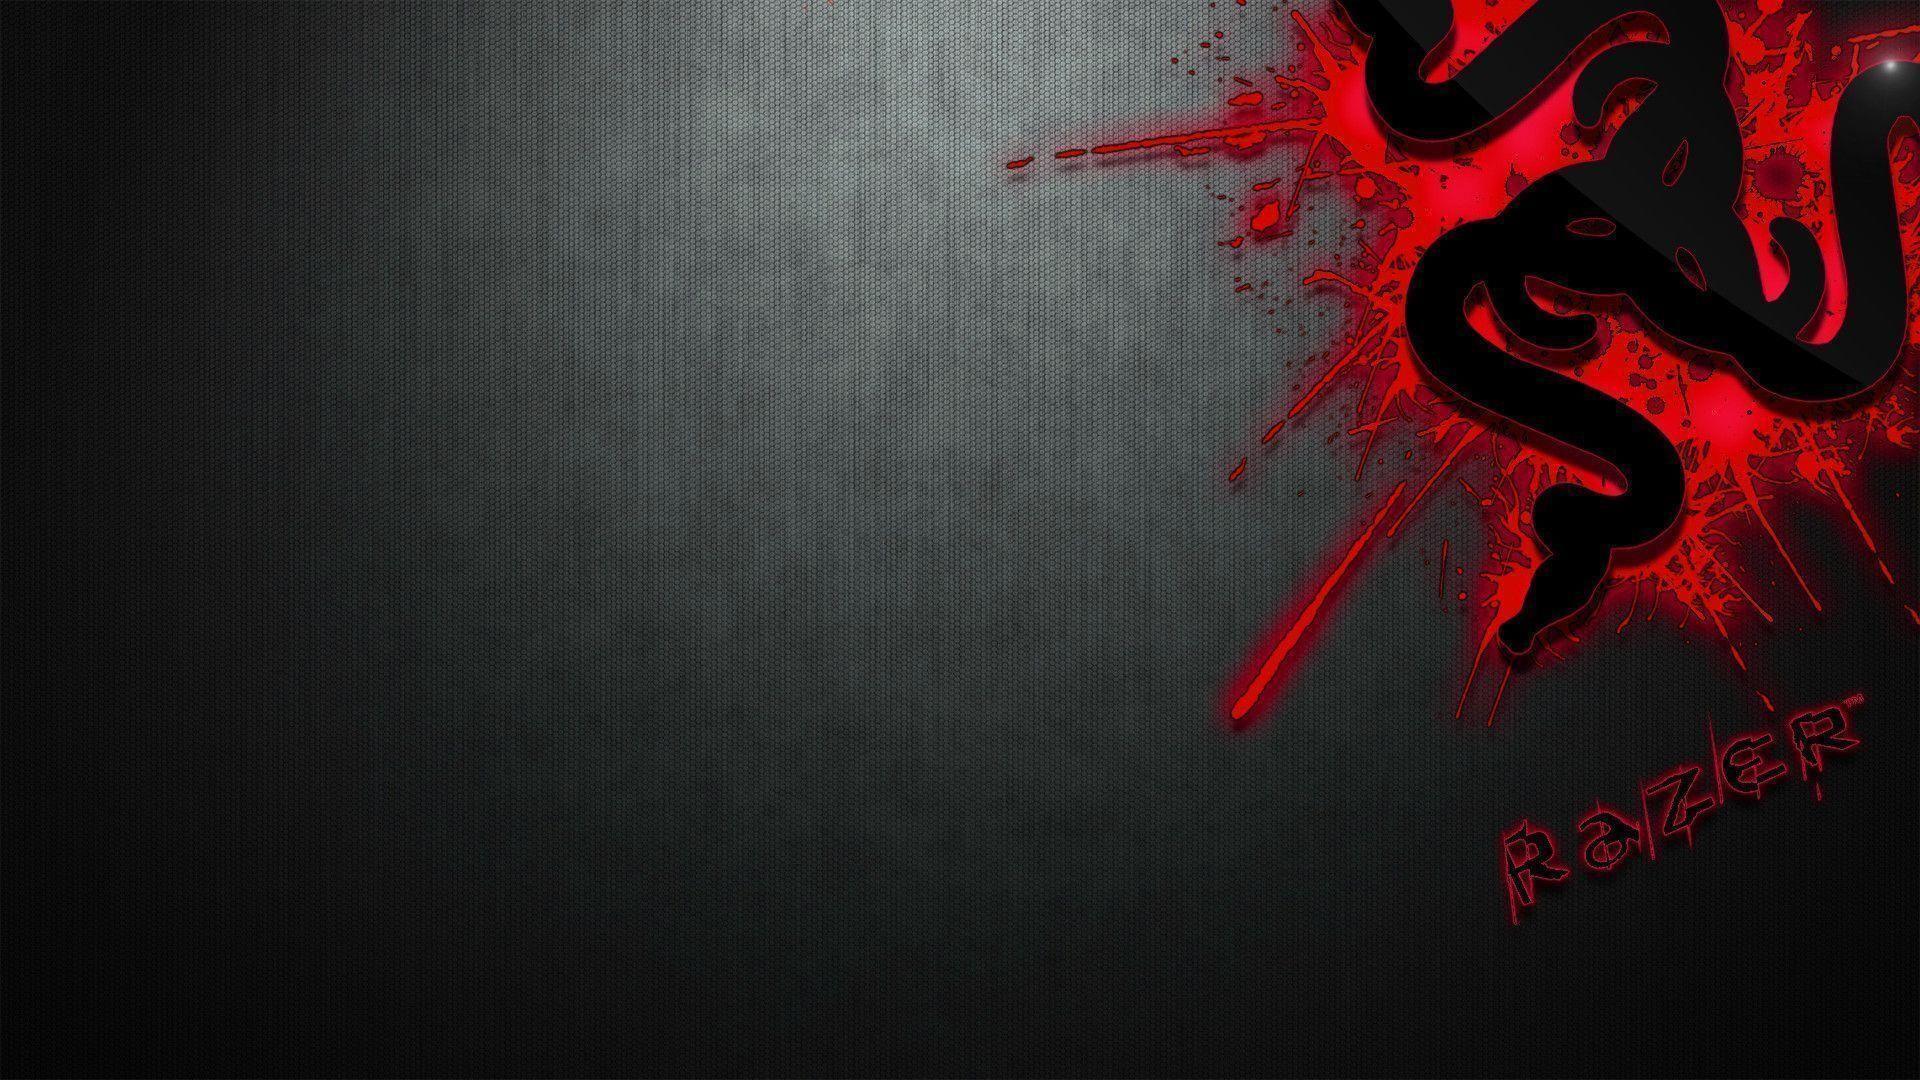 Wallpapers For > Razer Wallpaper Red